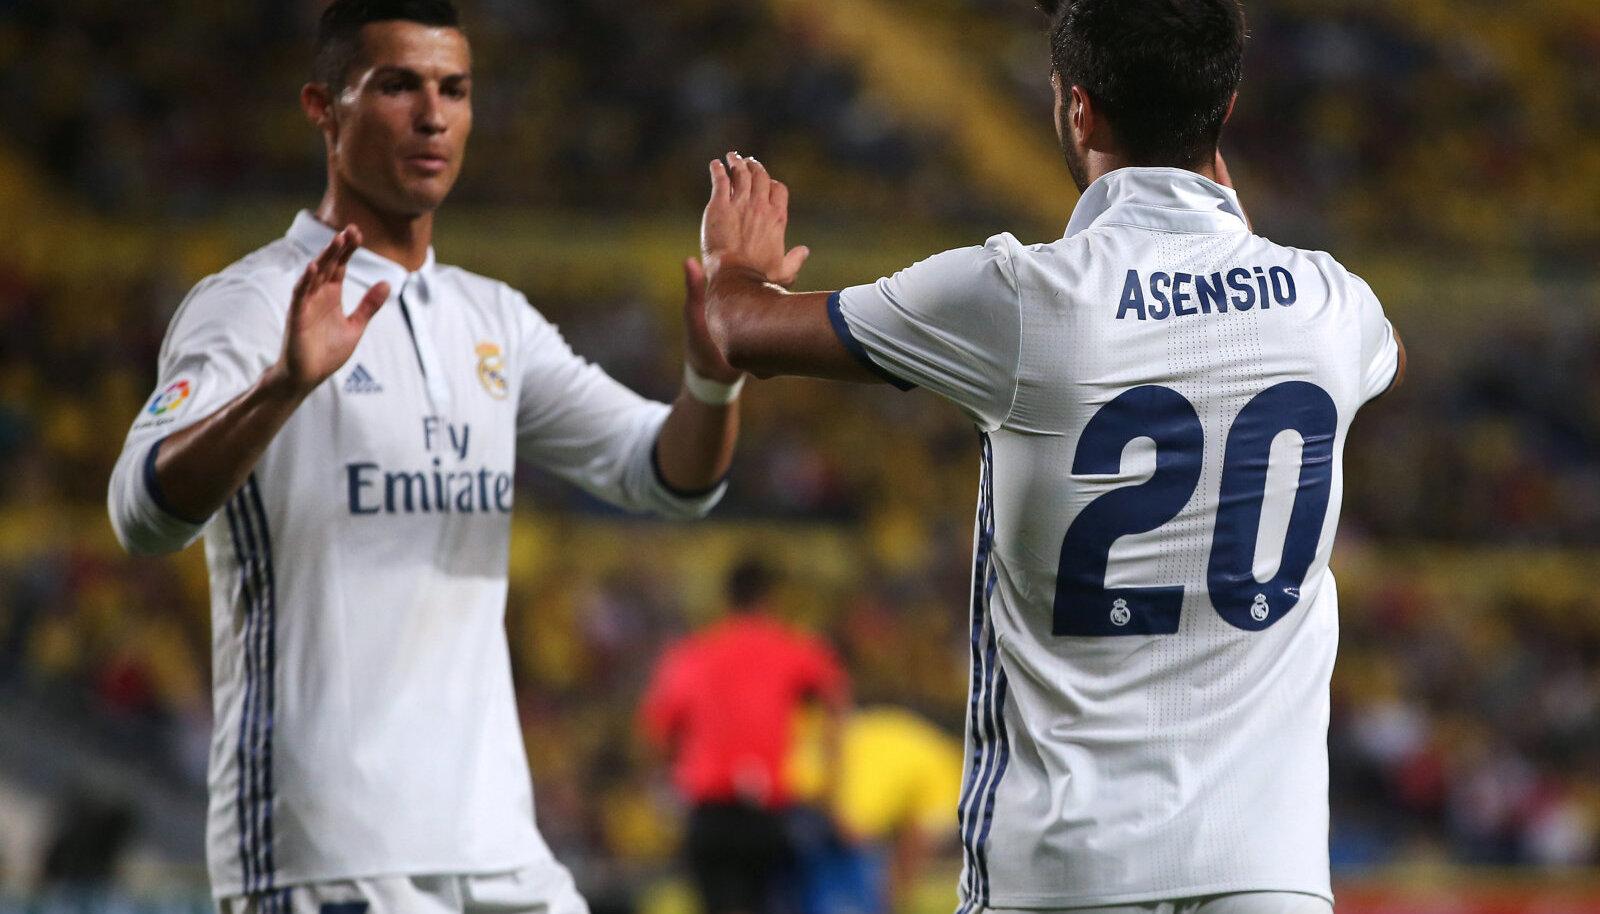 Marco Asensio Madridi Reali särgis koos Ronaldoga